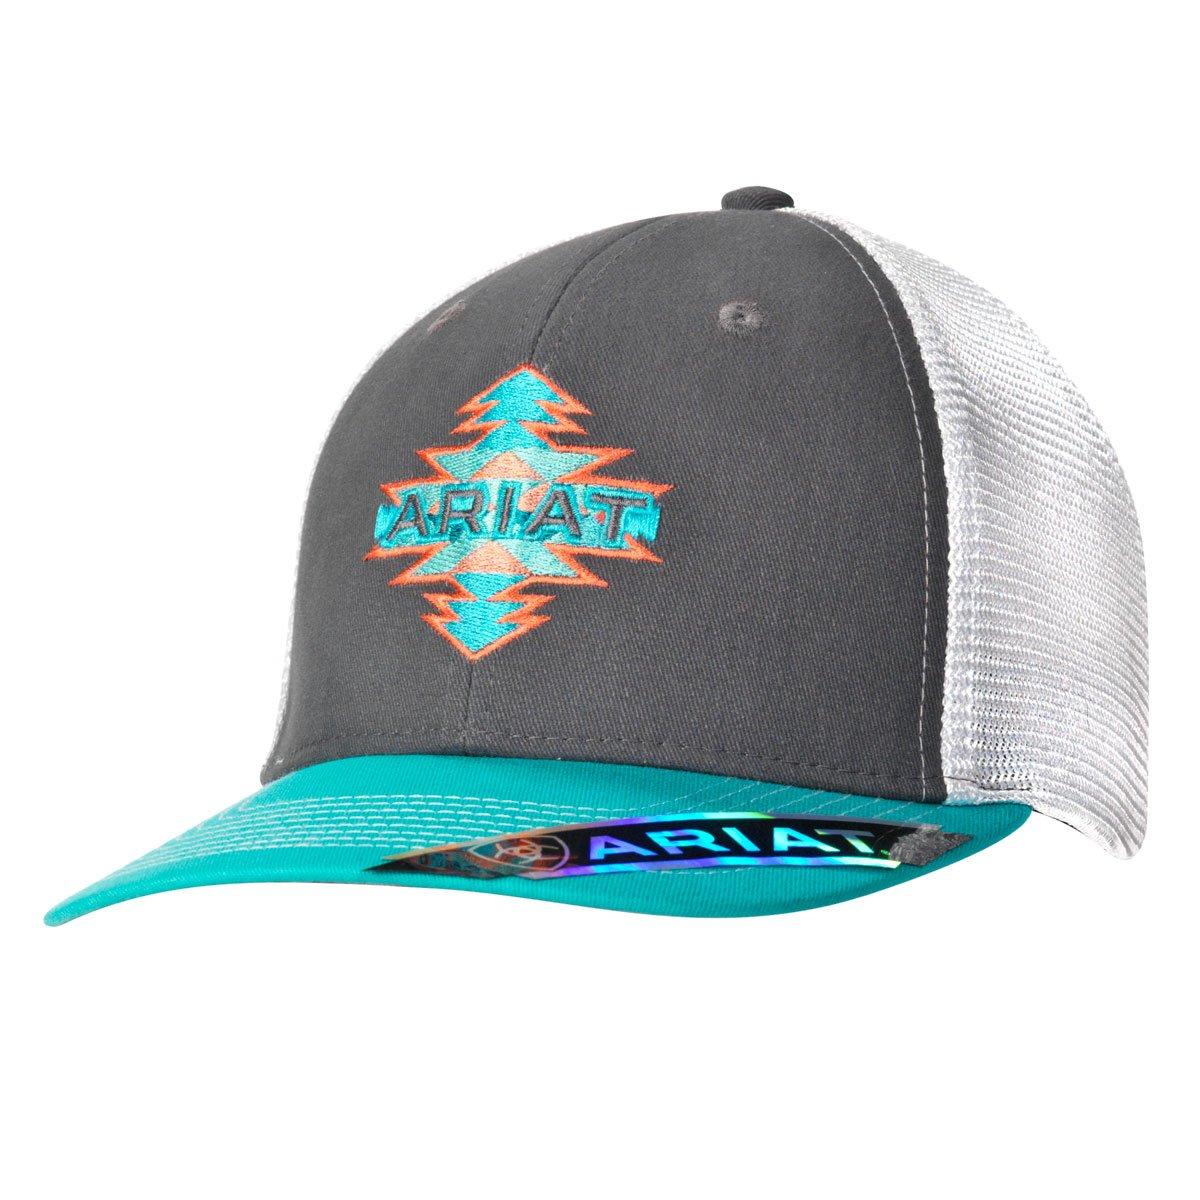 93408e3e7 Ariat Women's Gray Turquoise Snapback Baseball Cap | My style ...